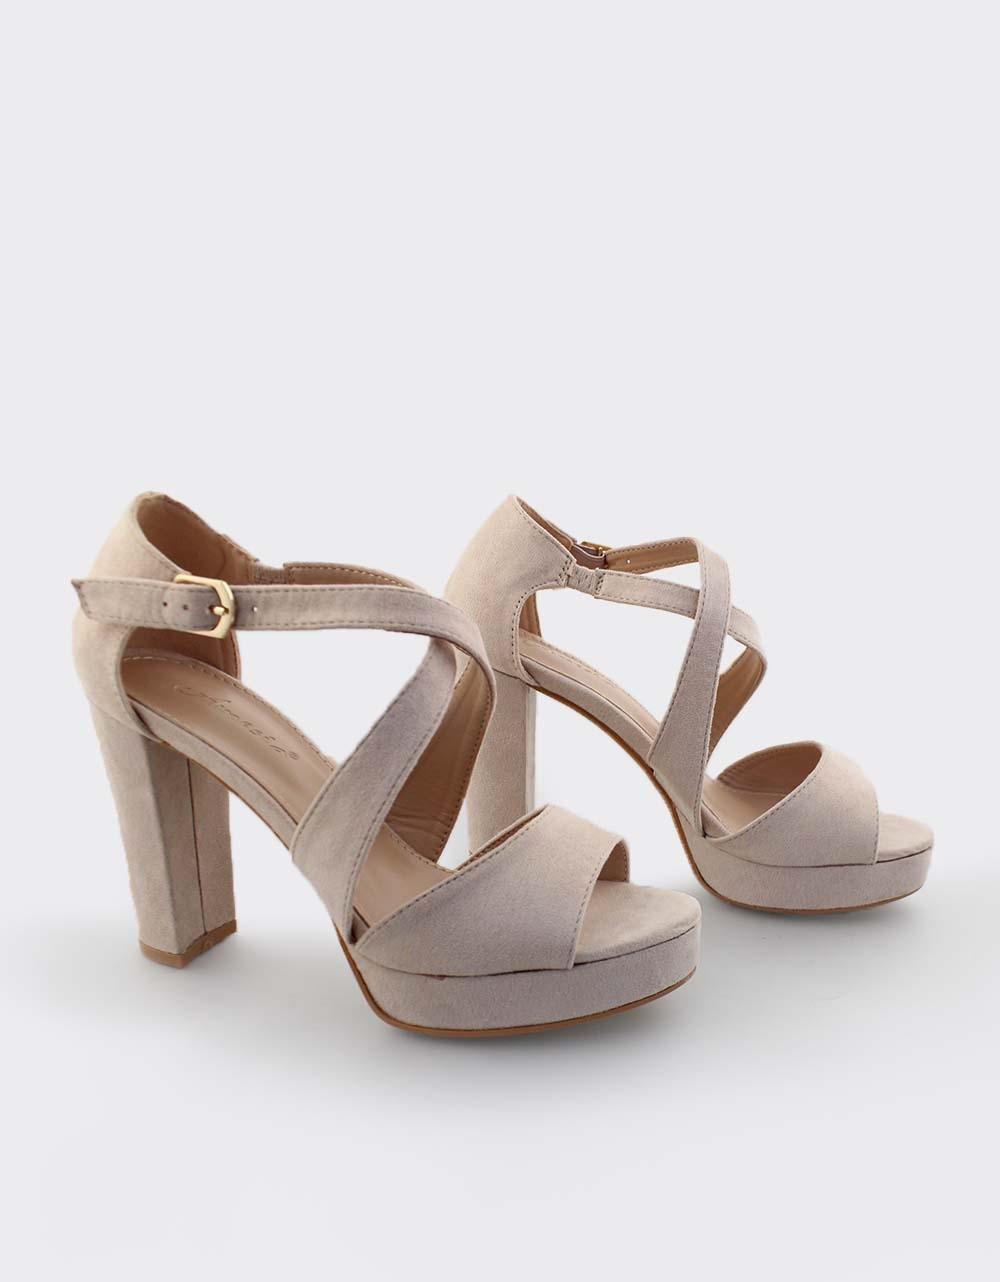 2f544255743 Inshoes.gr. Γυναικεία πέδιλα με χιαστί λουριά | Inshoes.gr Μπεζ